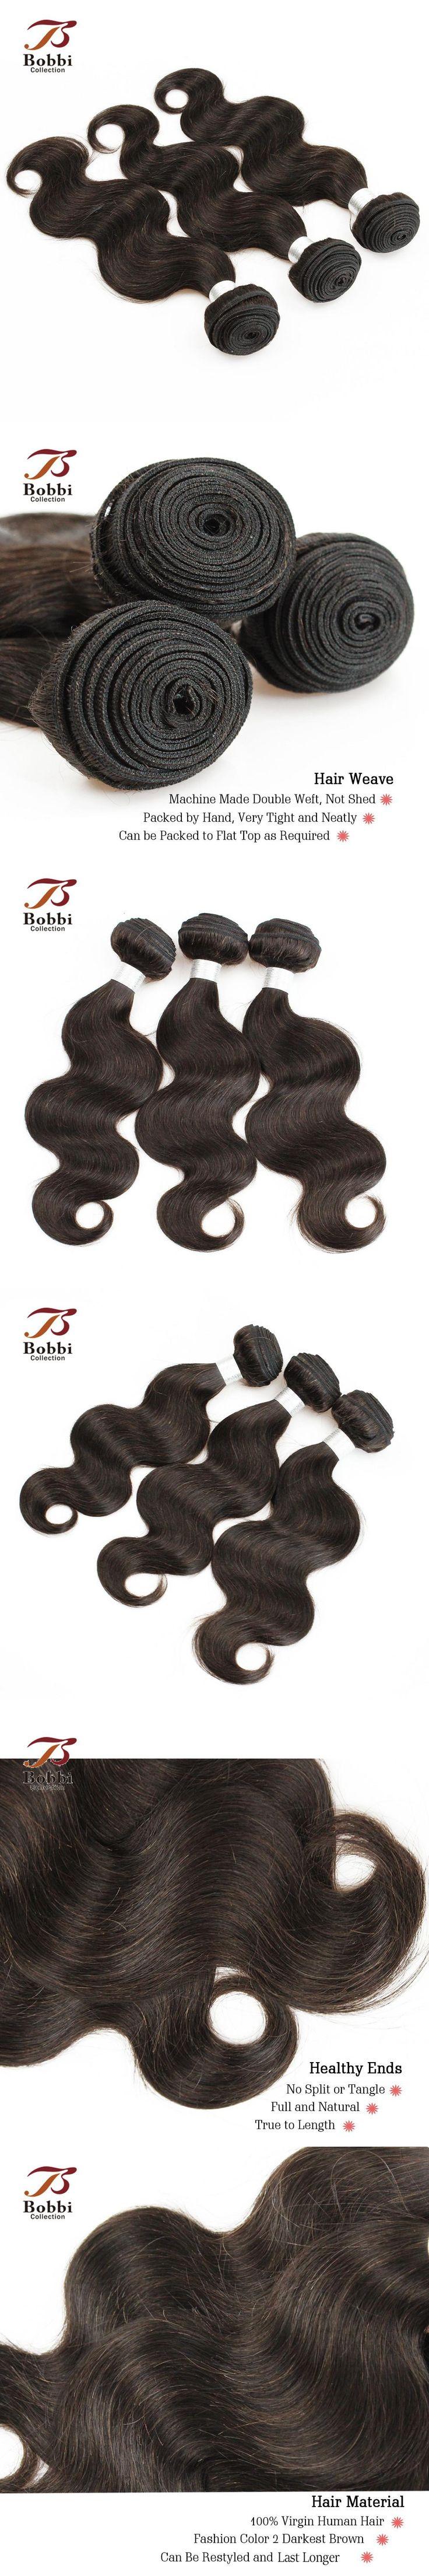 Brazilian Body Wave Hair Weave 3 Bundles Darkest Brown Color 2 Brazilian Human Hair Weft Extension Bobbi Collection